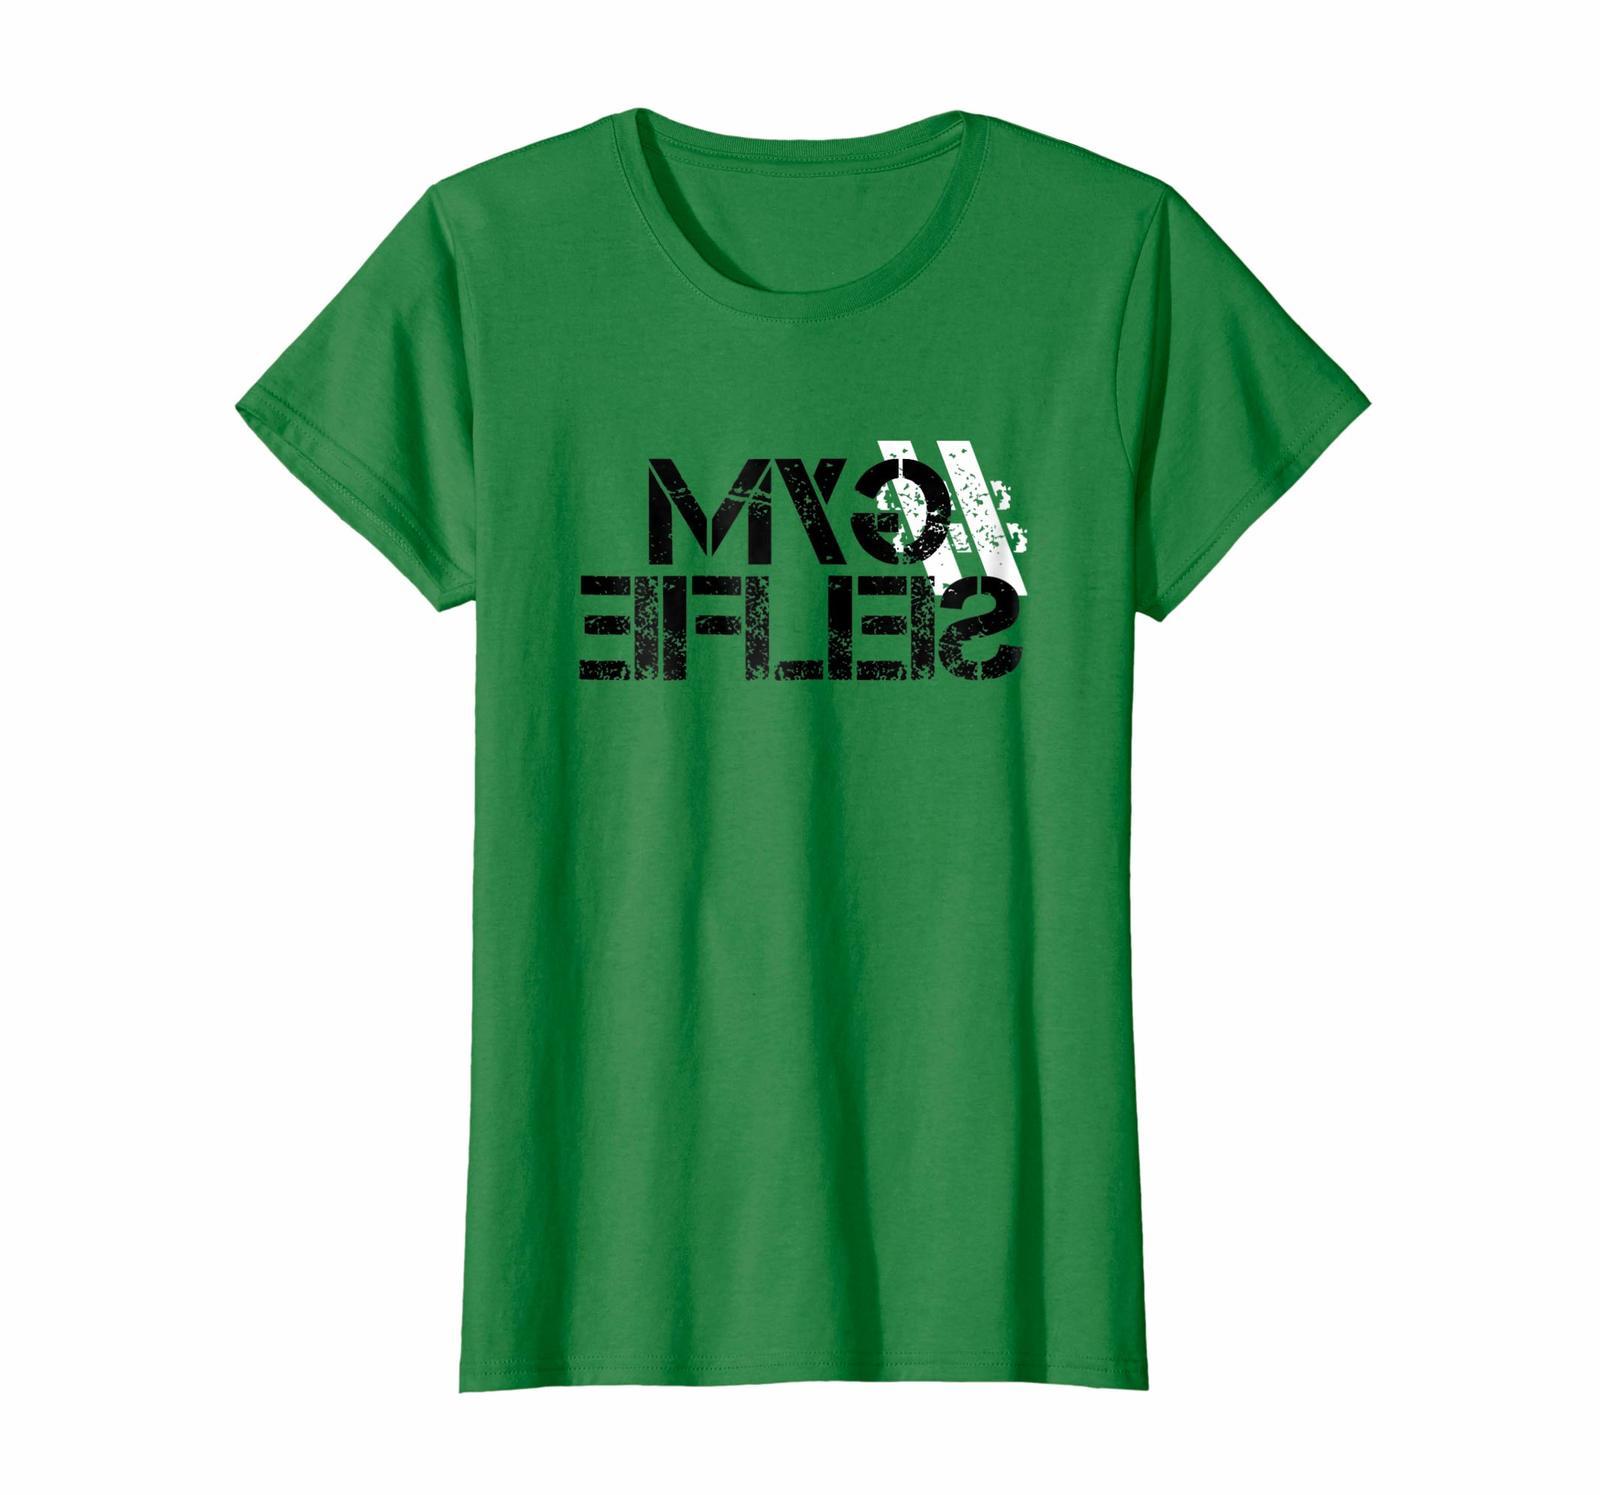 Funny Tee - Hashtag Gym Selfie T-Shirt - Trendy Social Media Tee Wowen